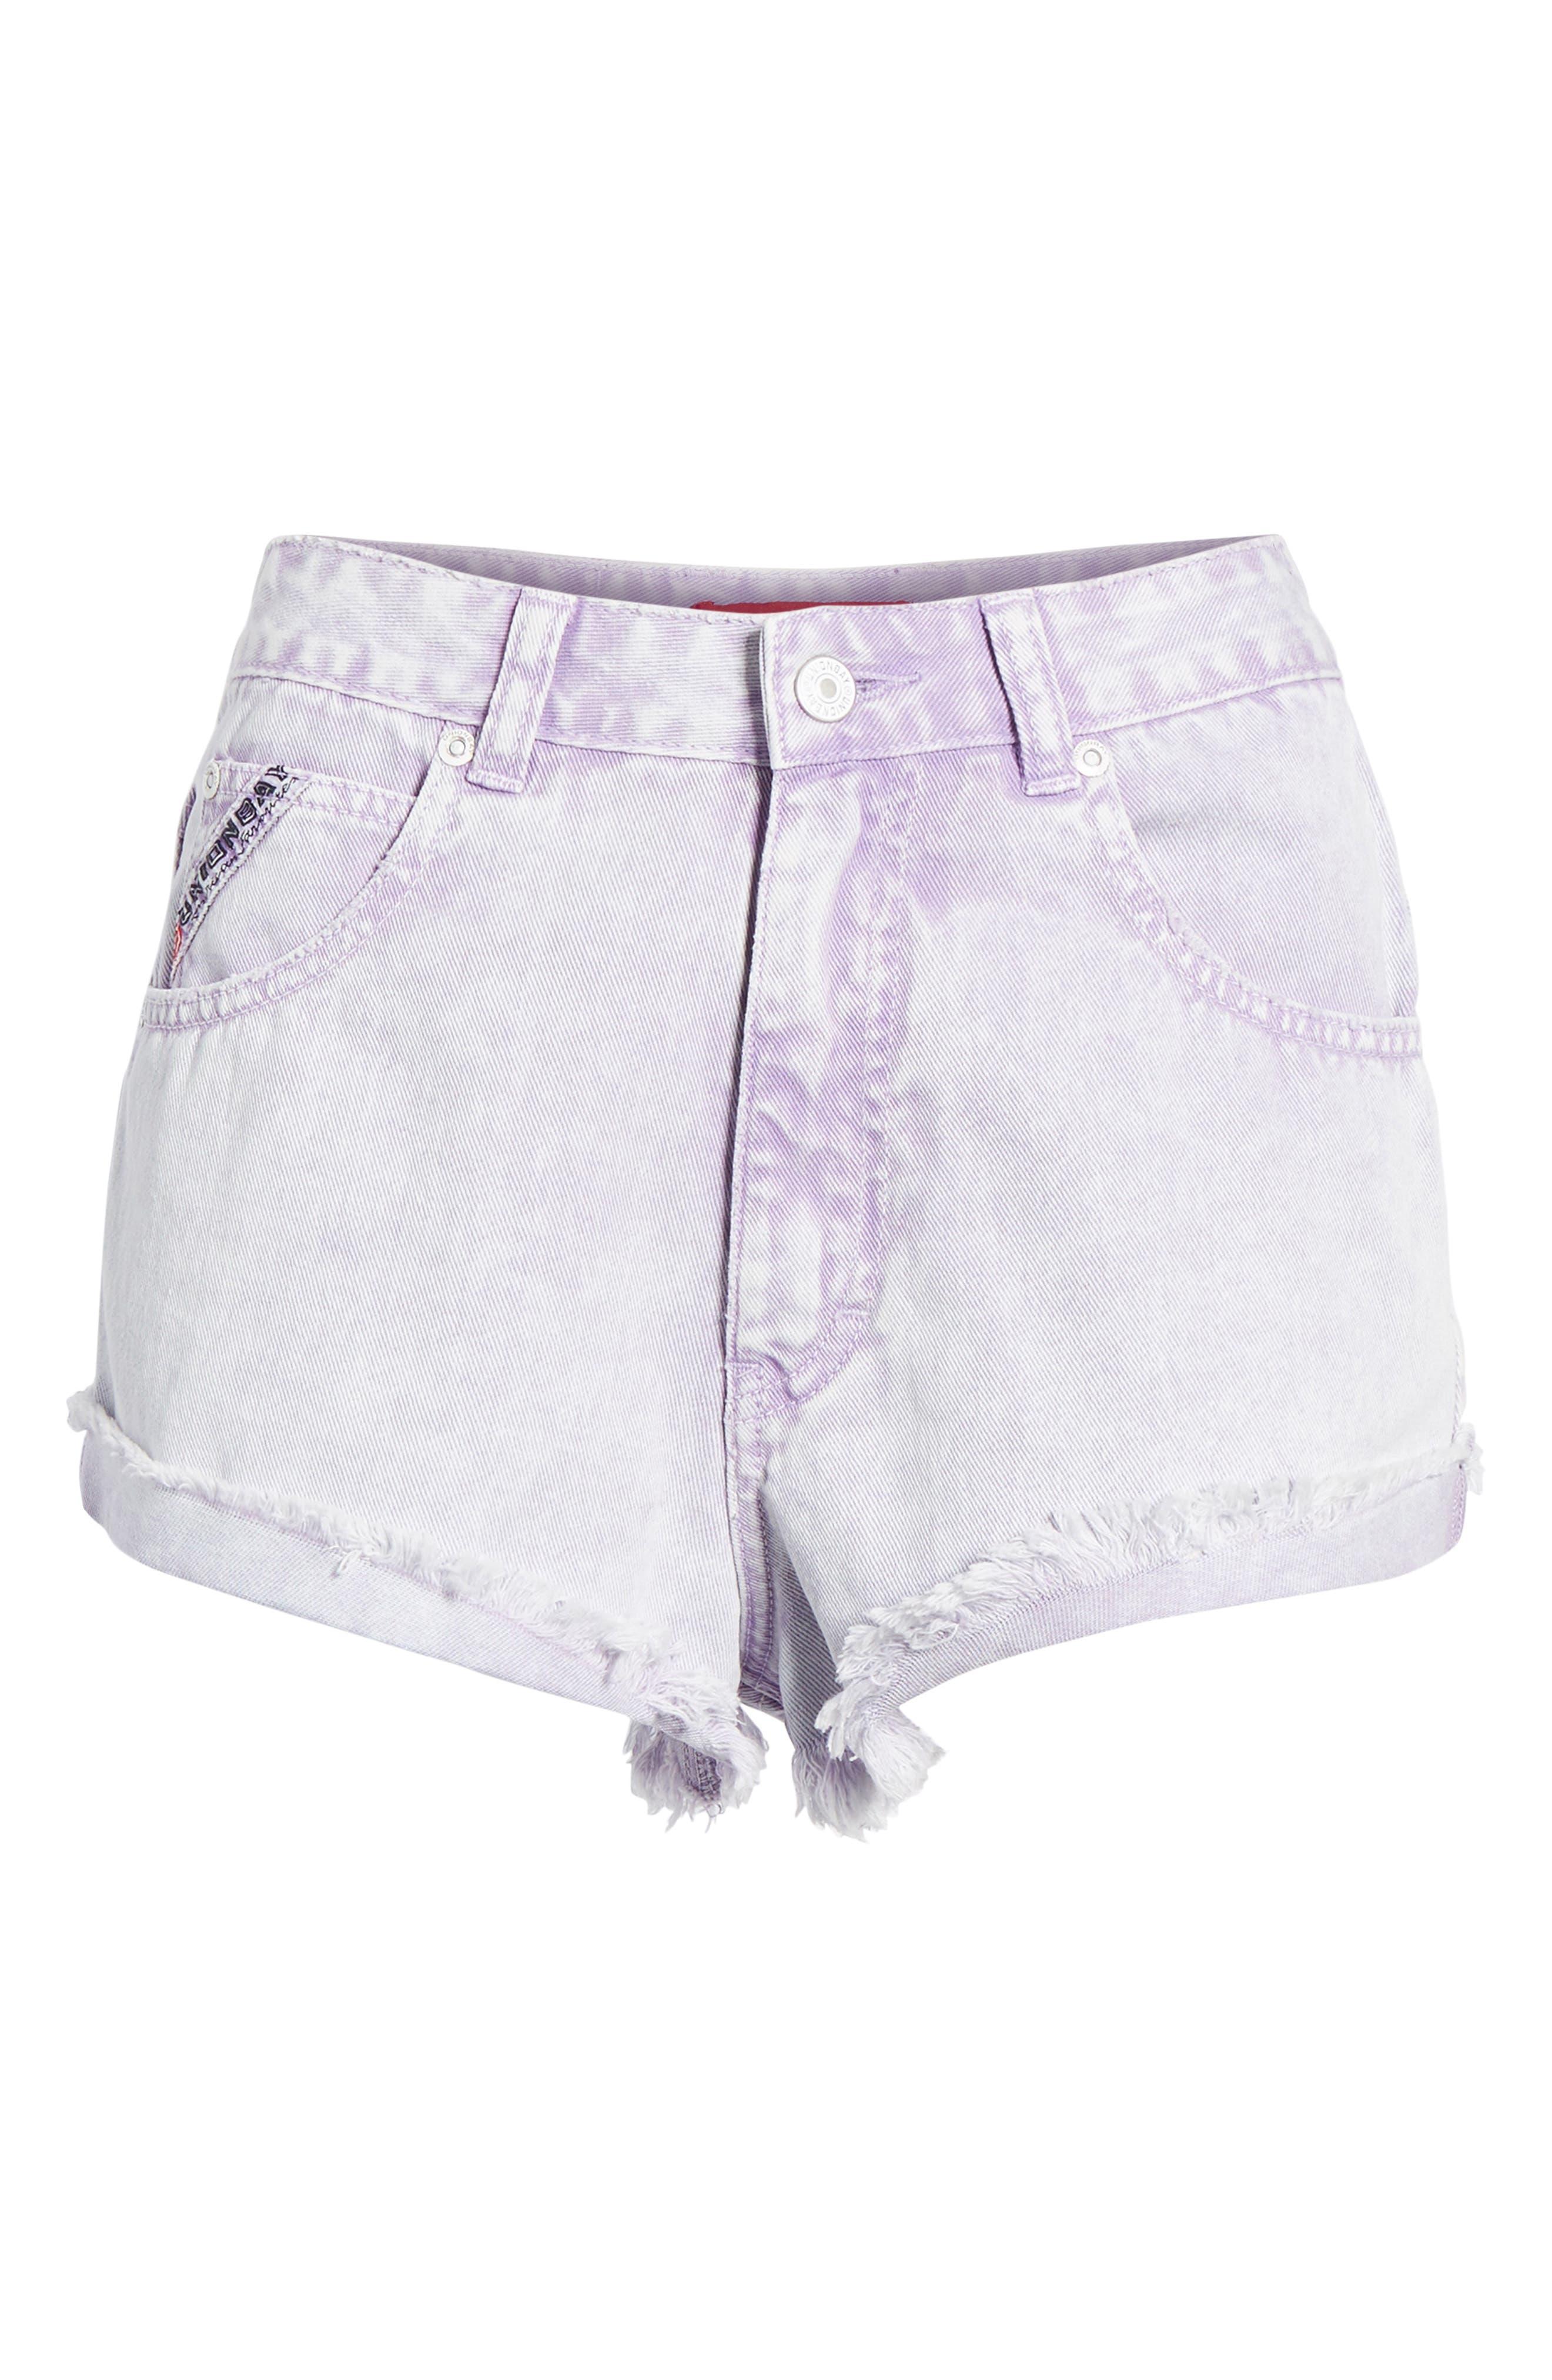 Unionbay Devo Acid Wash Denim Shorts,                             Alternate thumbnail 6, color,